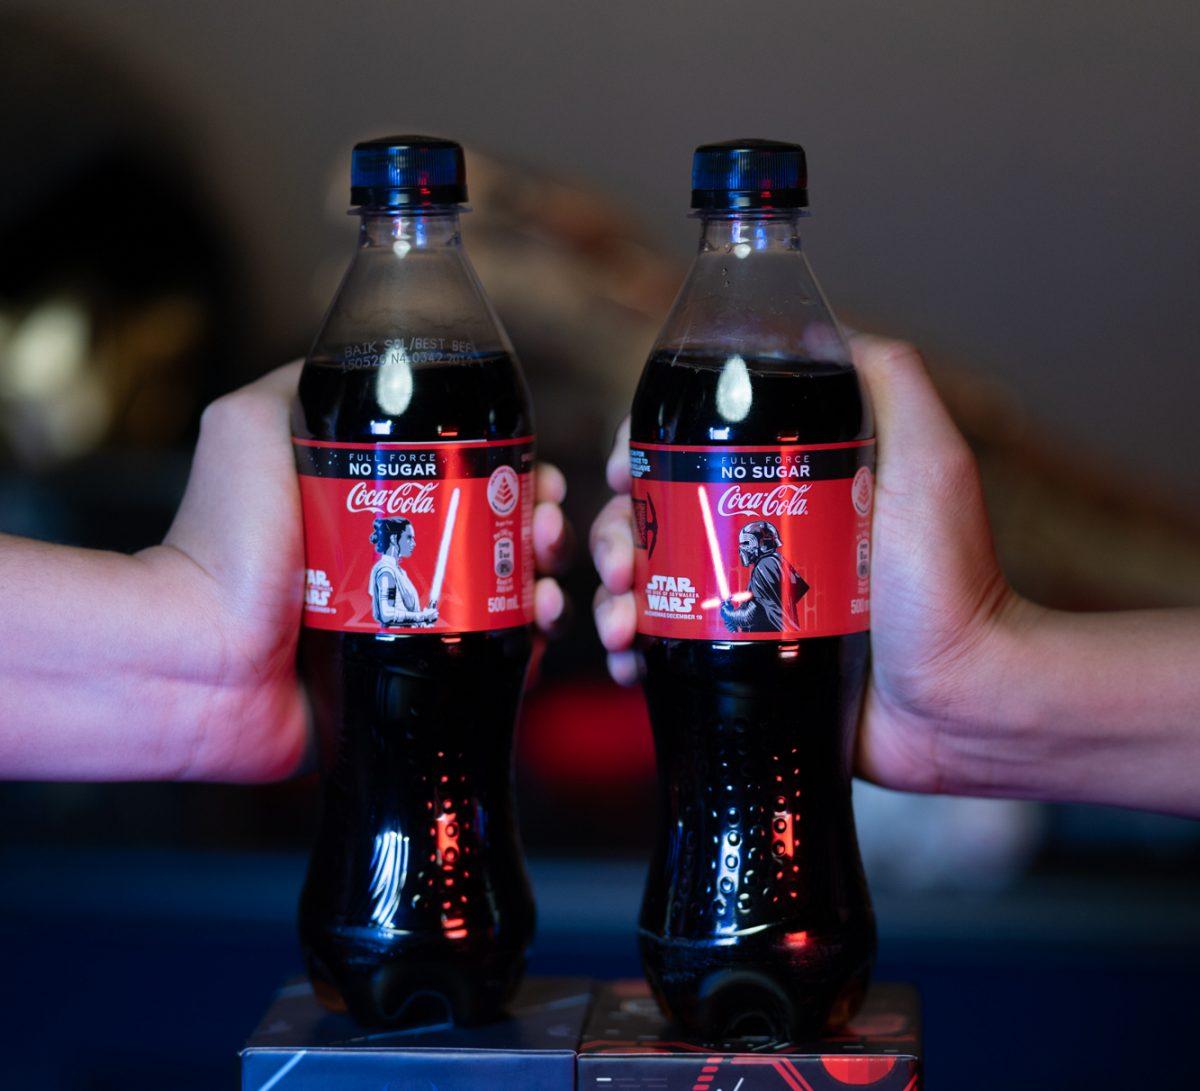 star-wars-limited-edition-light-up-the-rise-of-skywalker-coca-cola-bottles-1